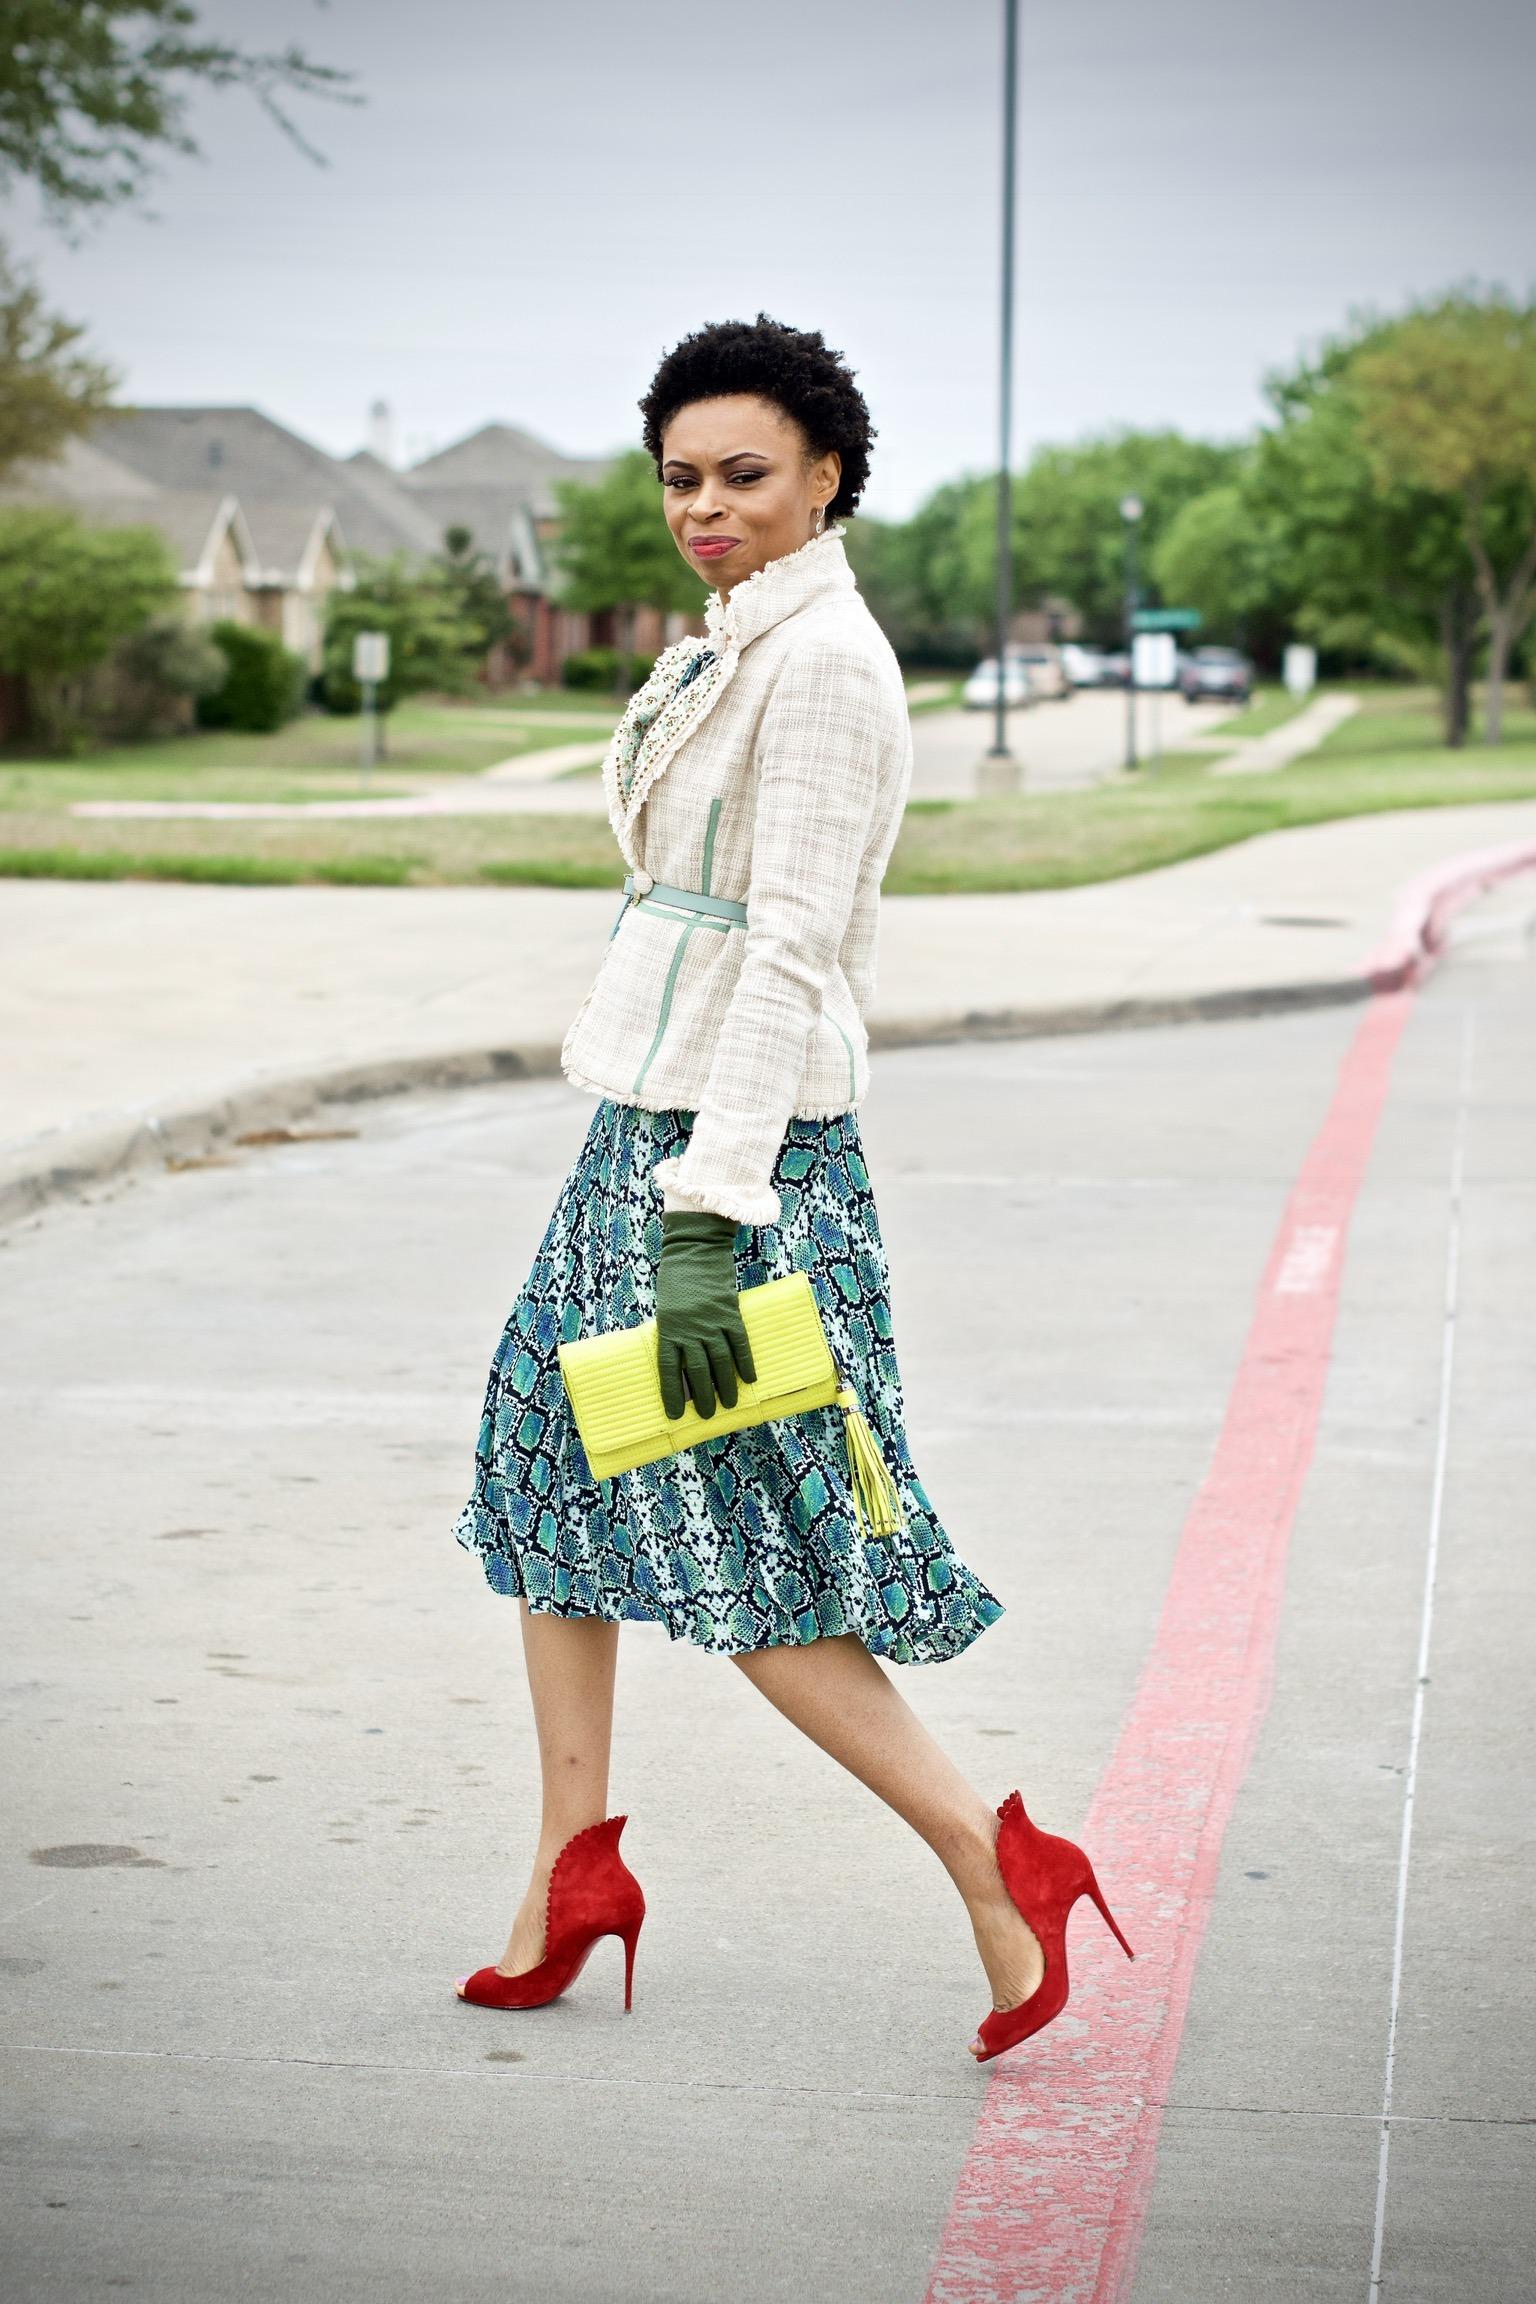 Styling Boucle Blazer + Midi dress for spring